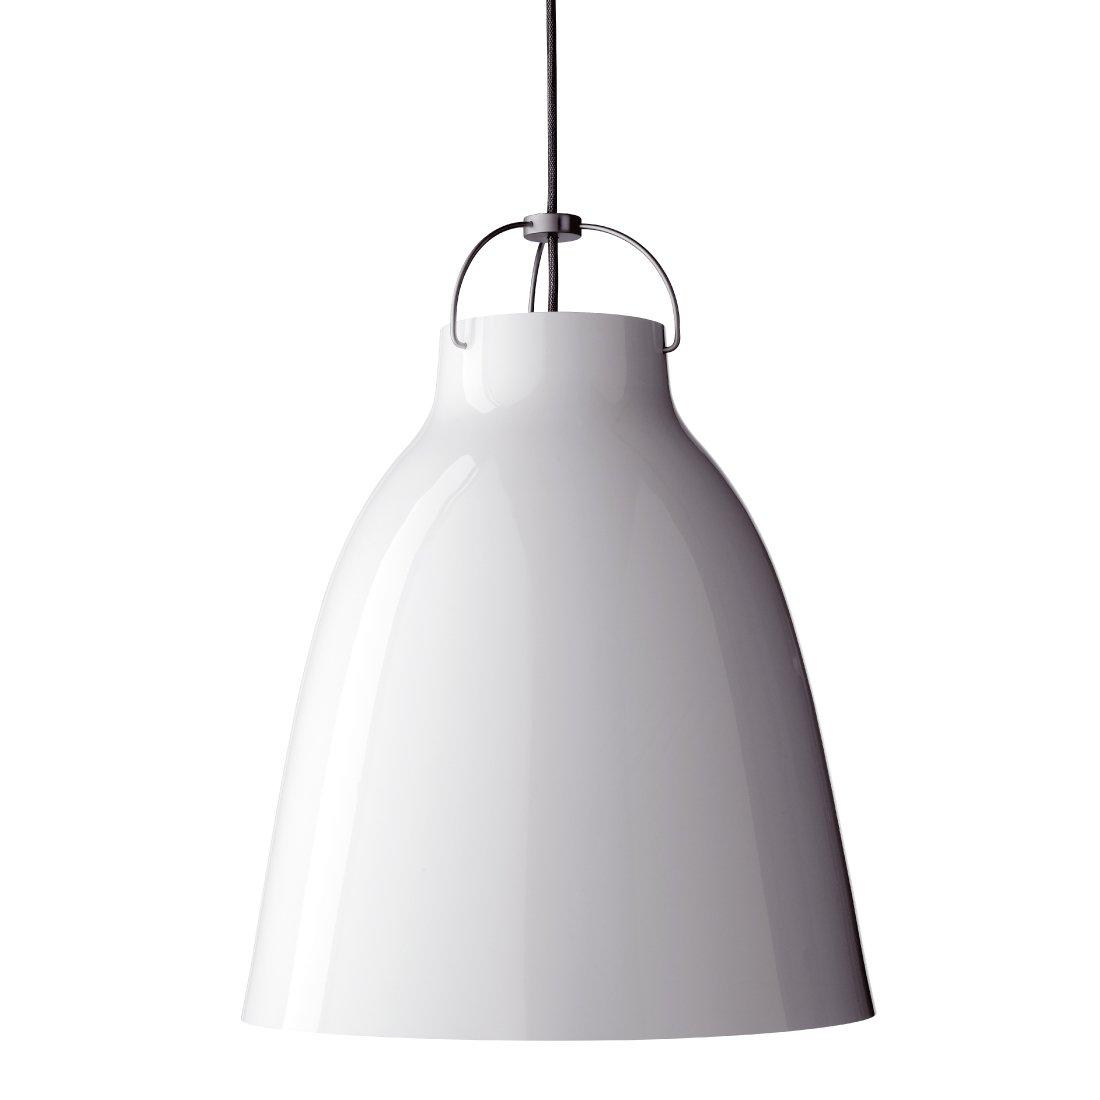 Lightyears Caravaggio P3 Mat Wit - Licht Grijs - Snoer 600 cm